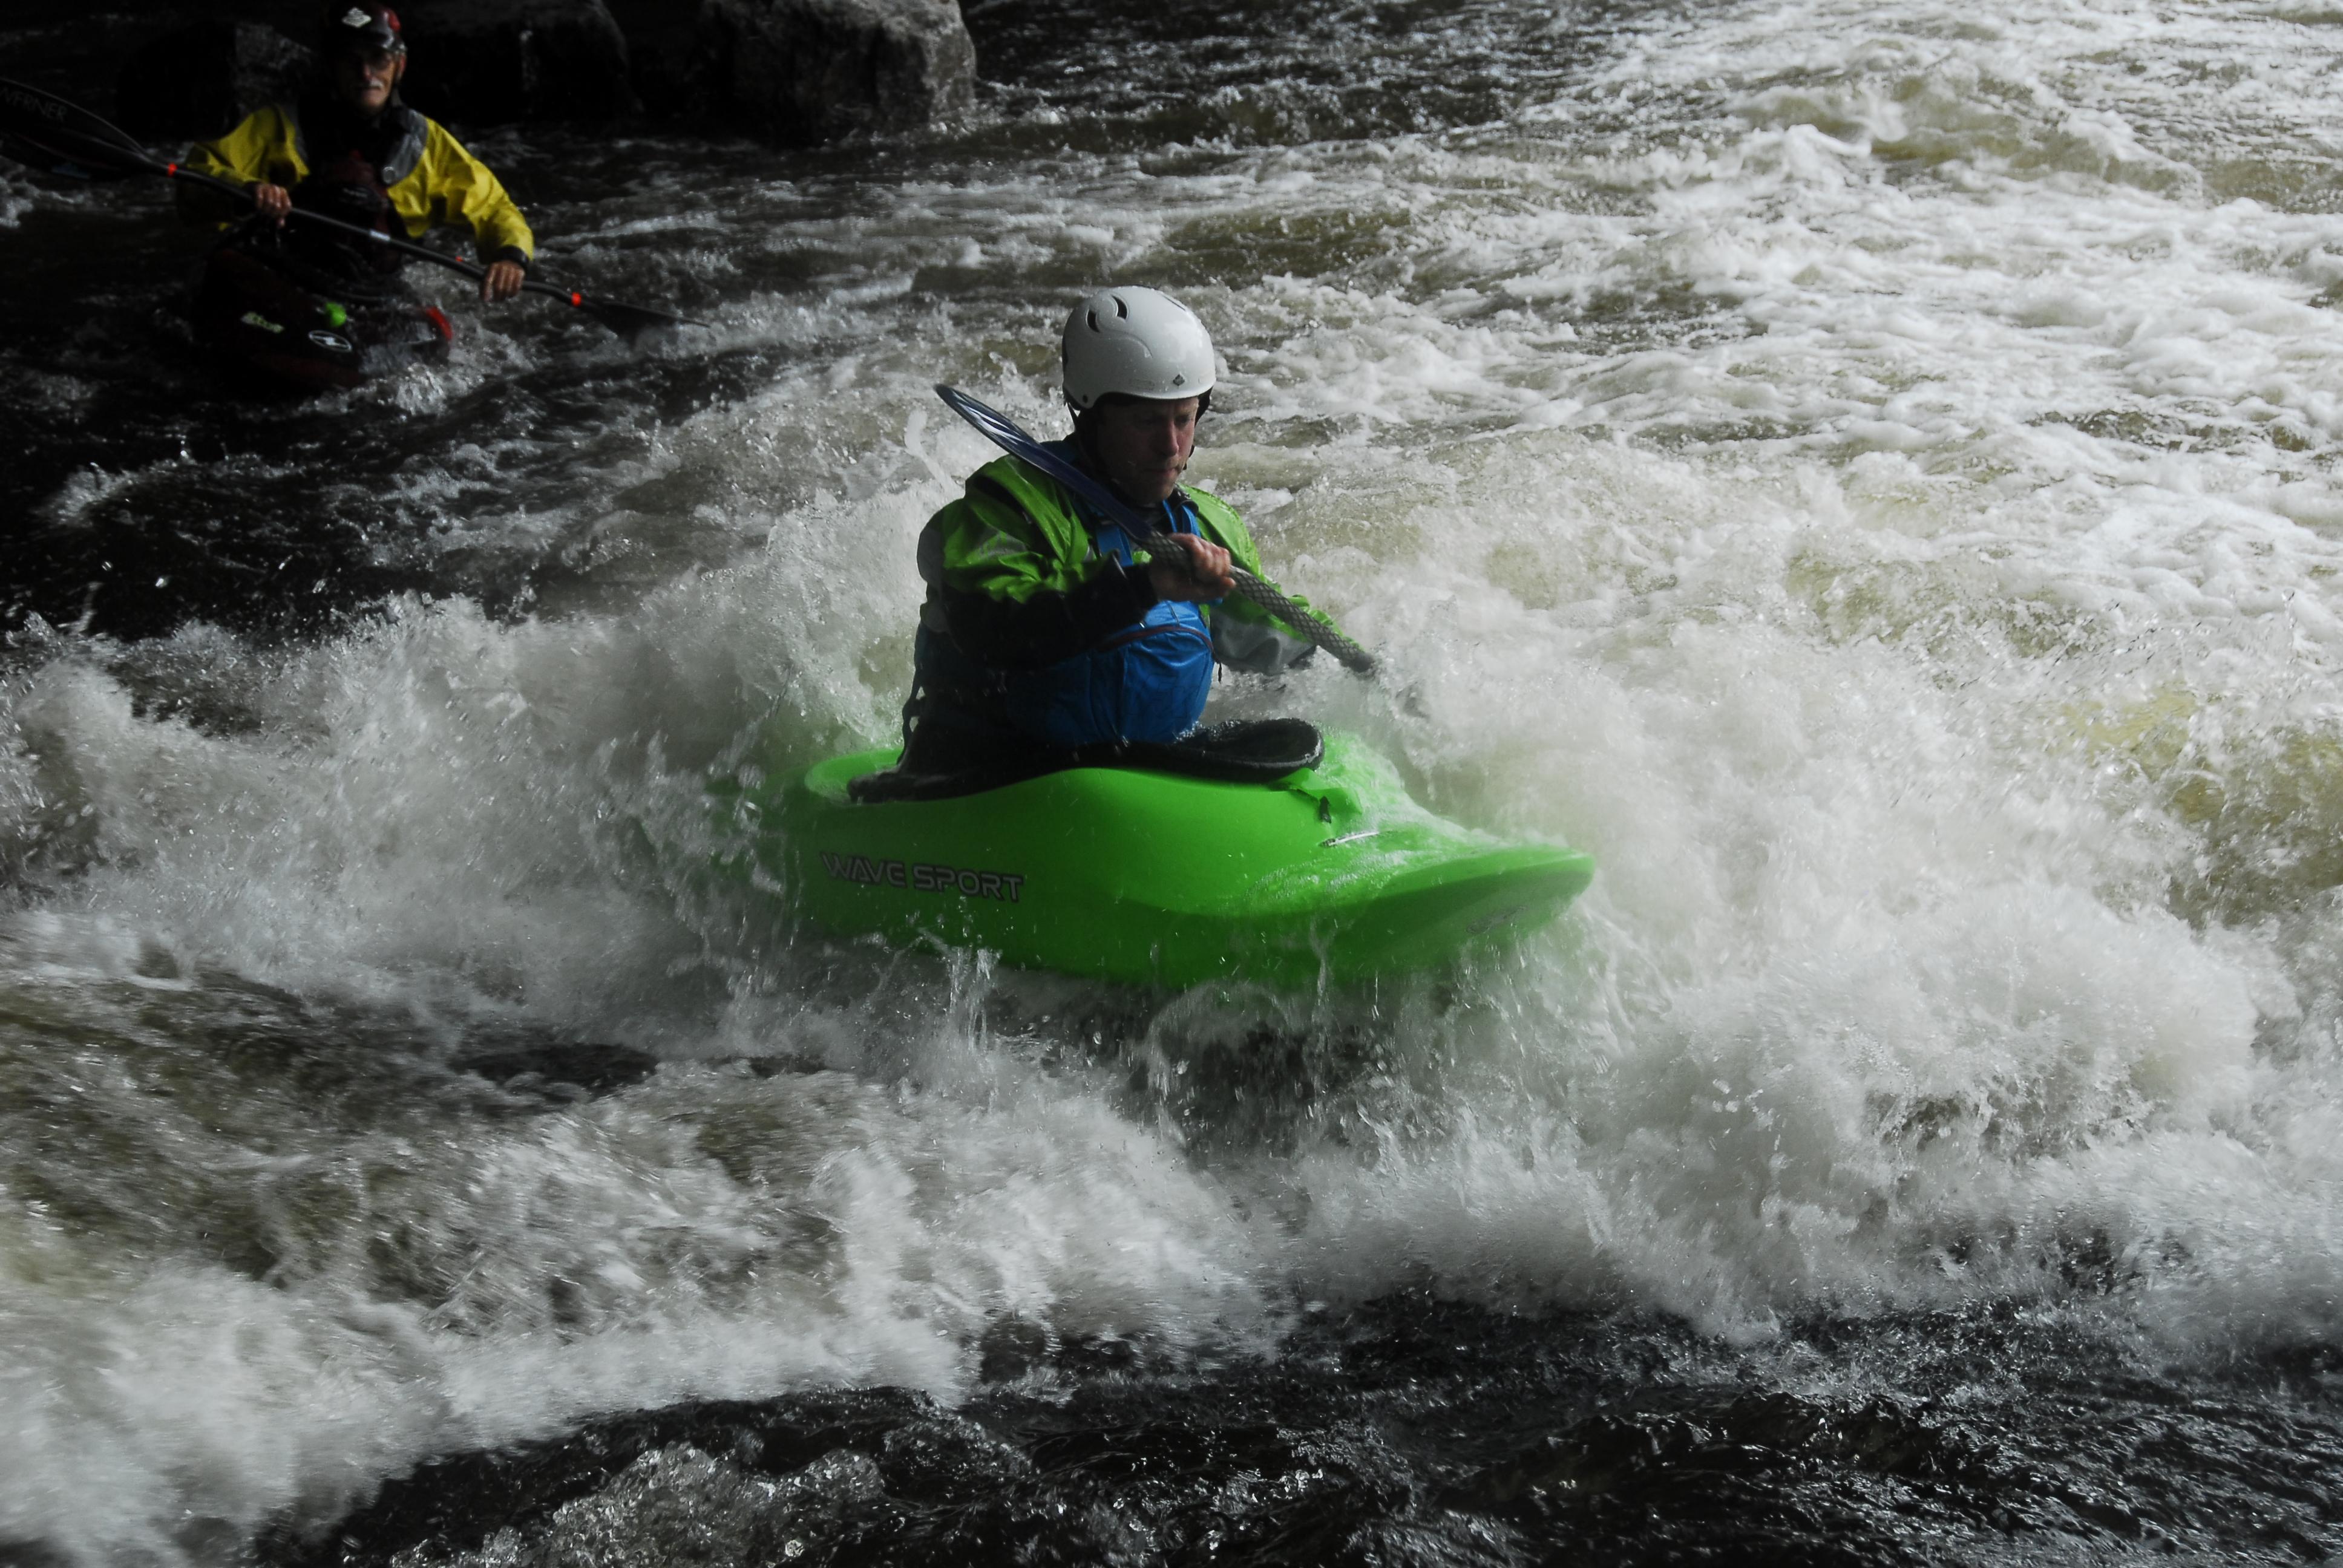 Marathon canoeing